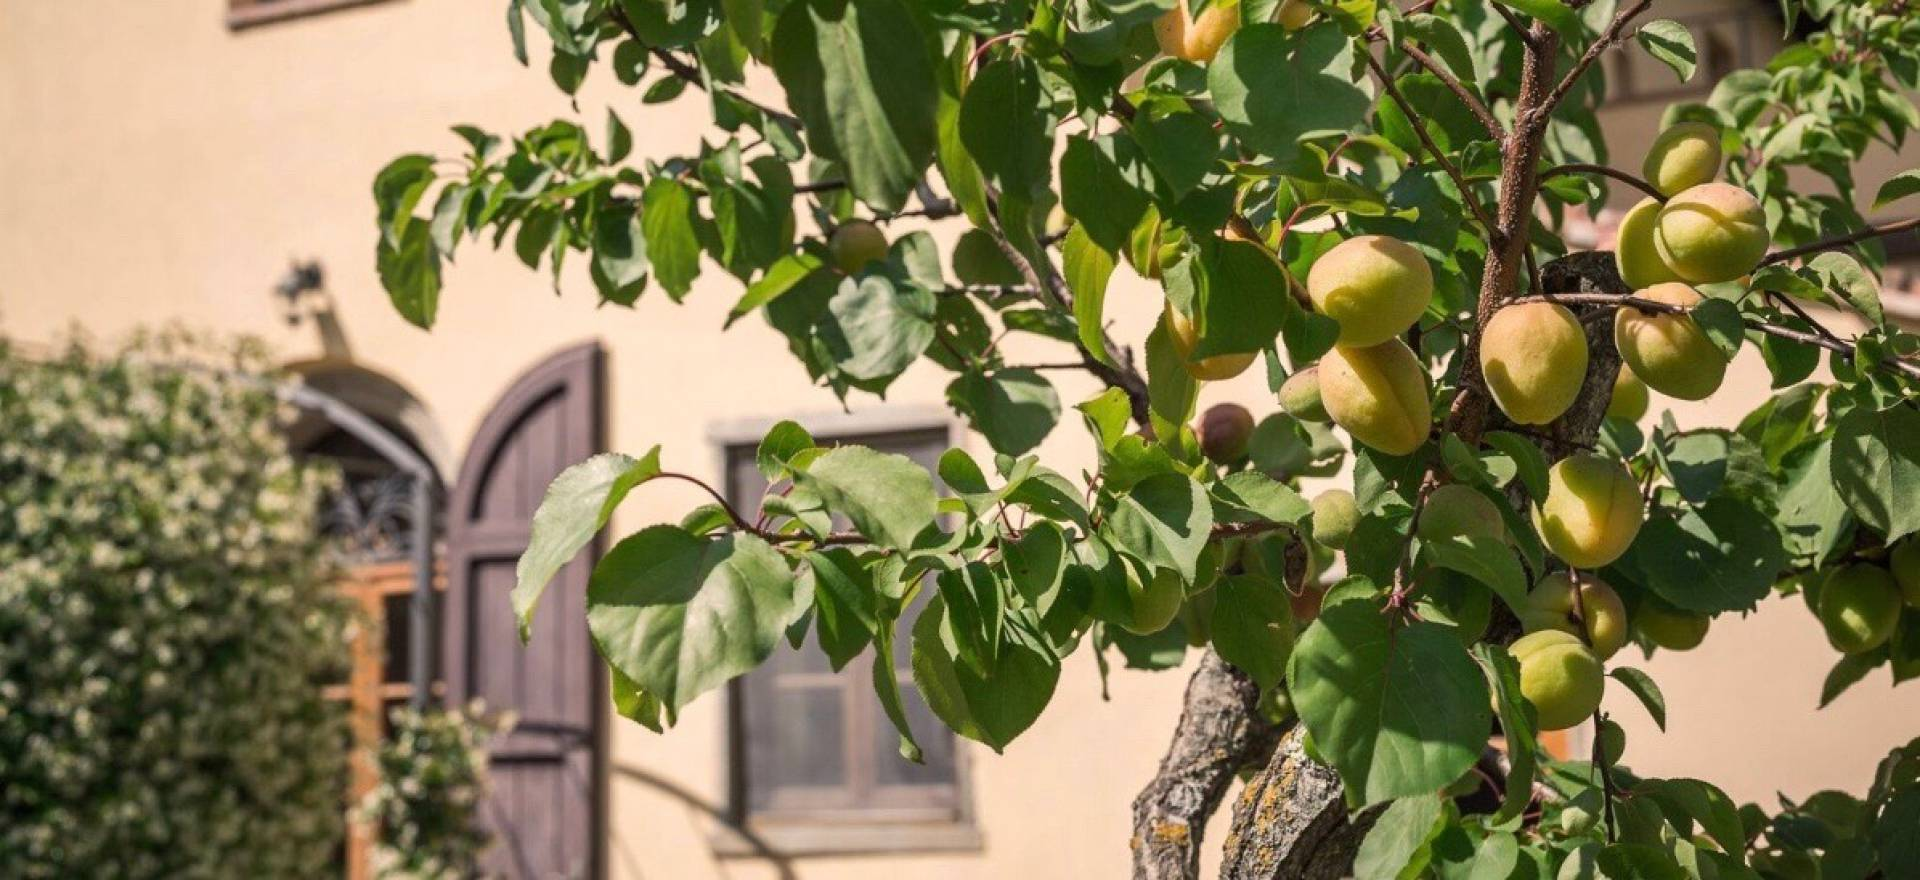 Agriturismo Toscana Agriturismo comodo nel Chianti, vicino Firenze